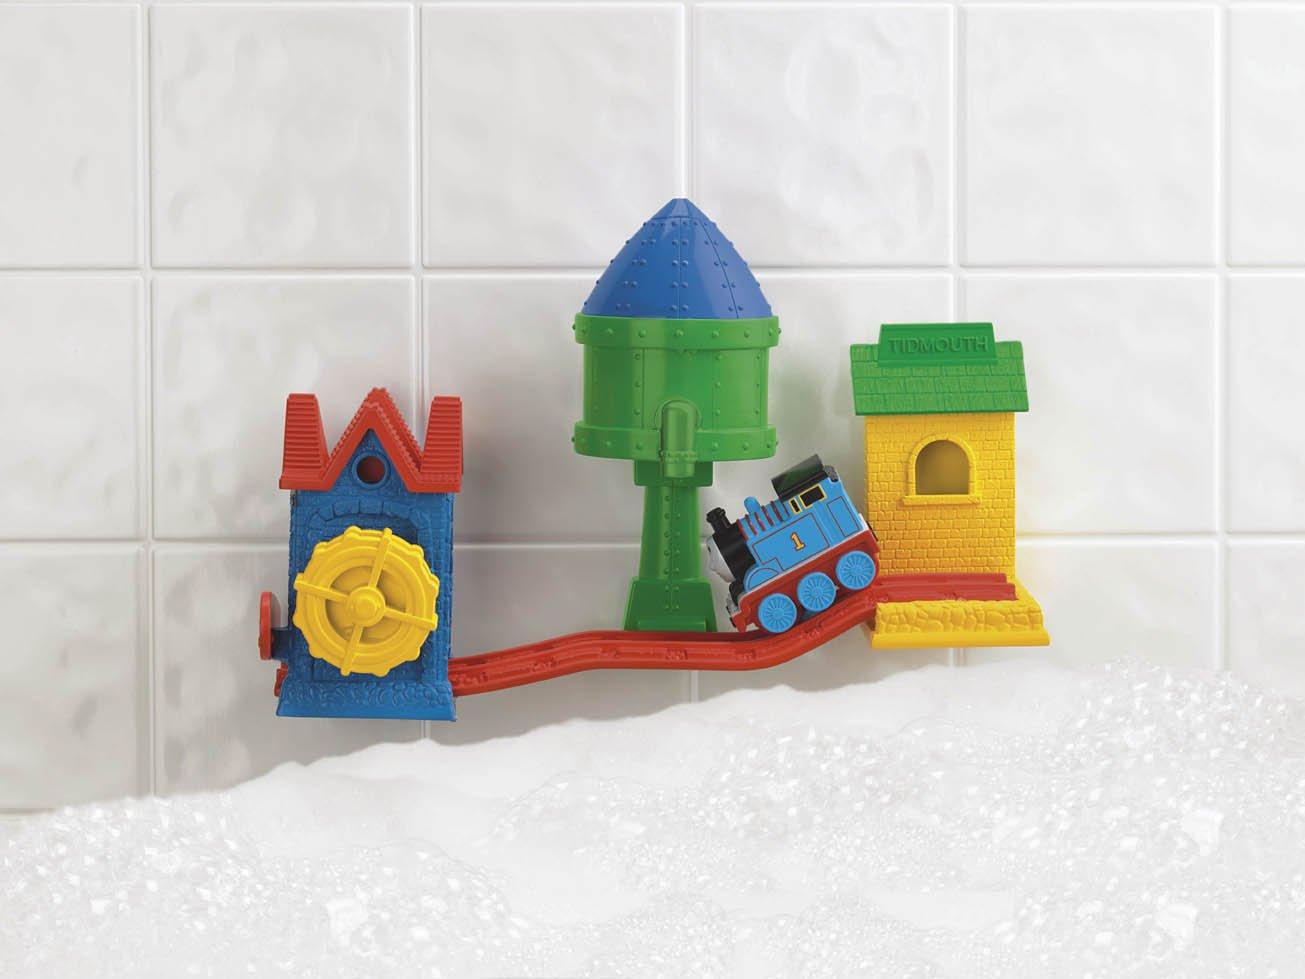 Amazon.com: Thomas & Friends Fisher-Price Thomas Bath Tracks: Toys ...